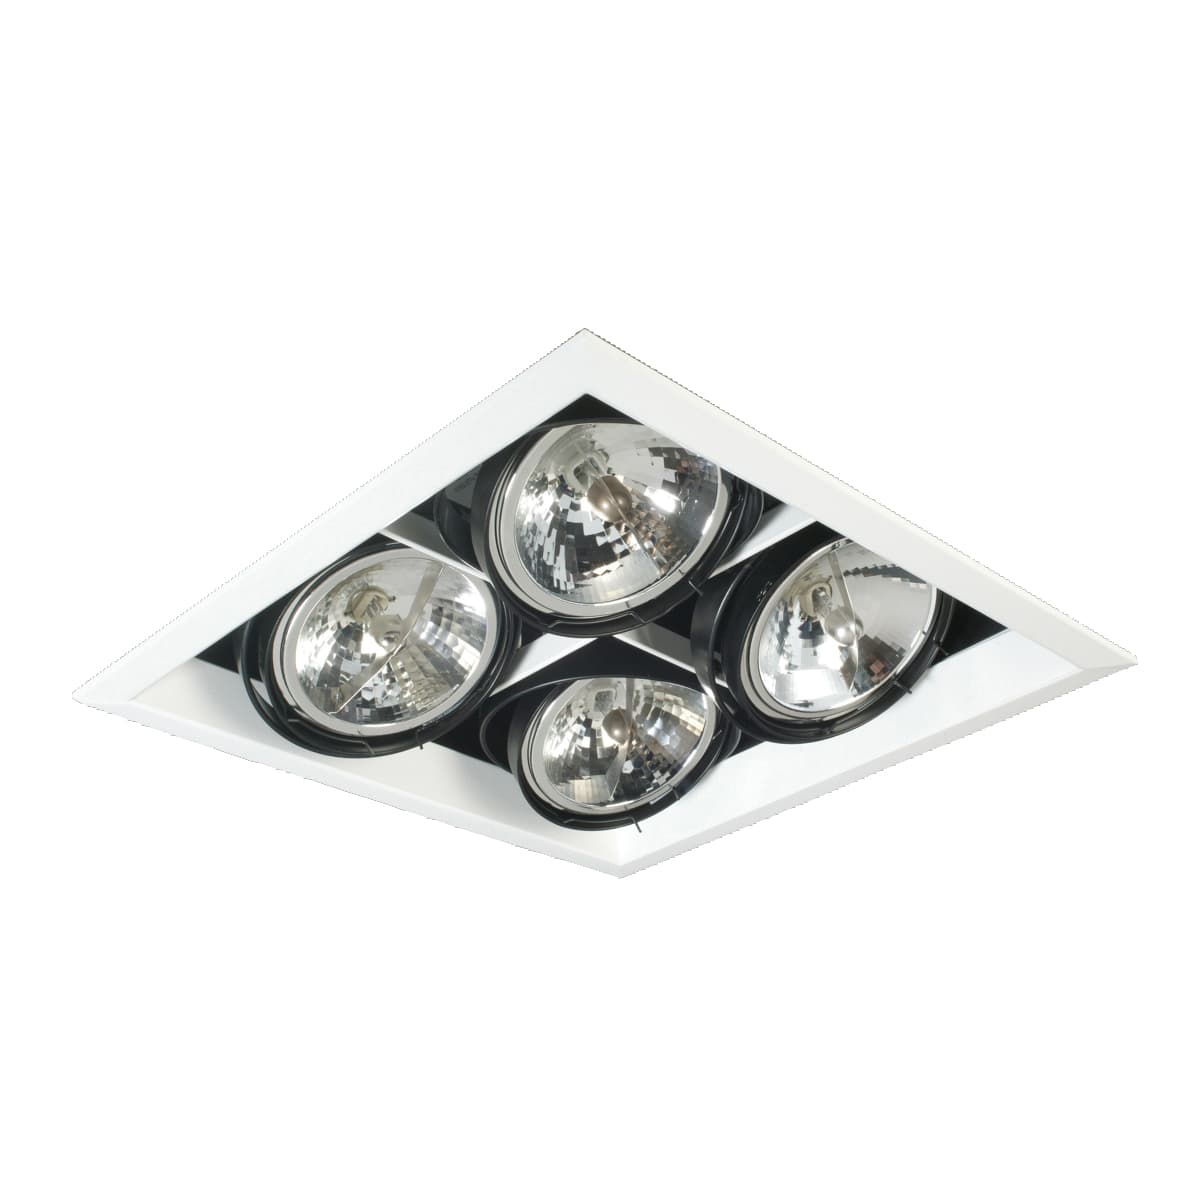 Eurofase lighting te104b 02 4 light 13 1 2 wide adjustable square recessed trim